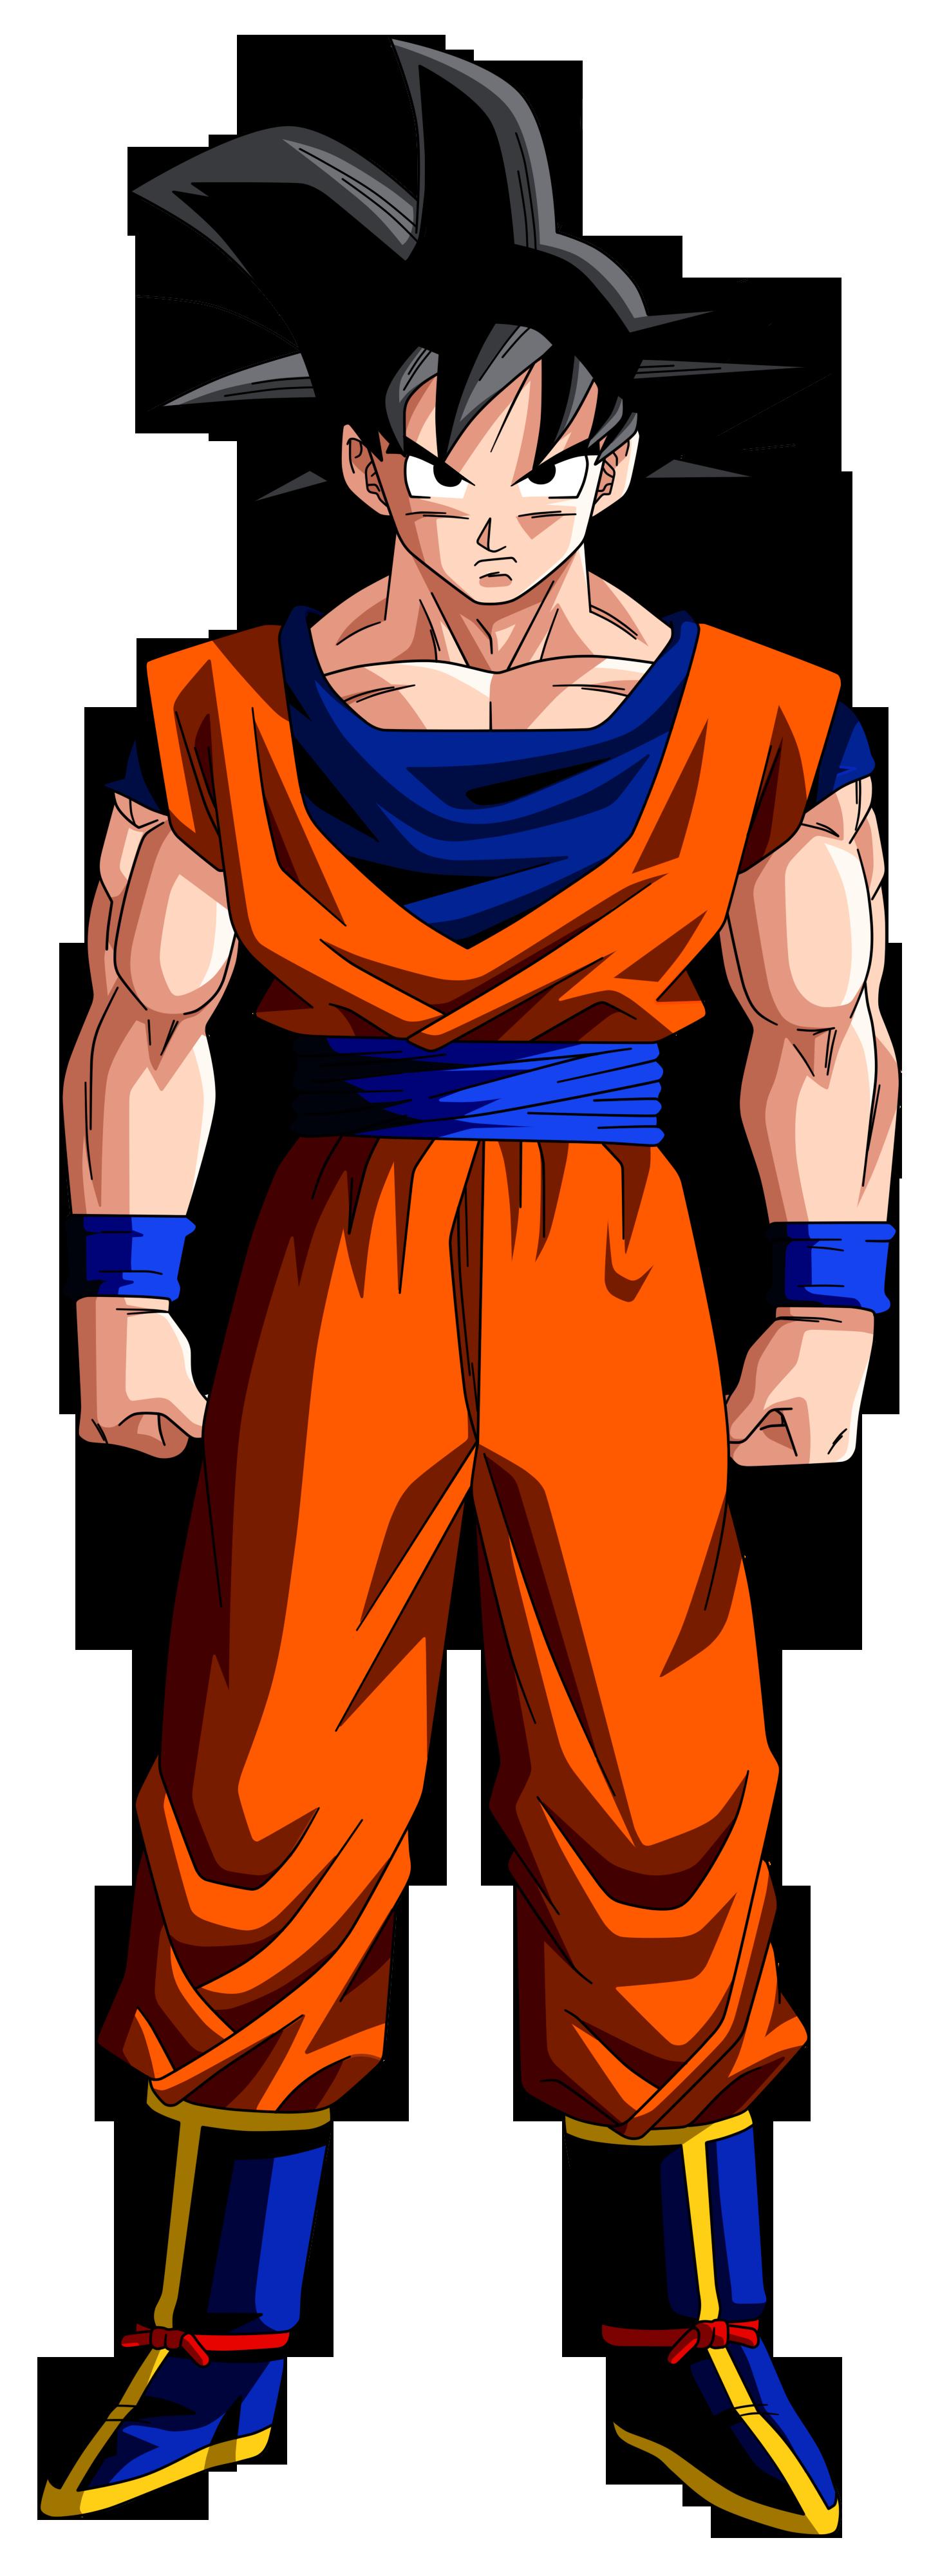 Goku Girl Dragonball Z Minecraft Skin